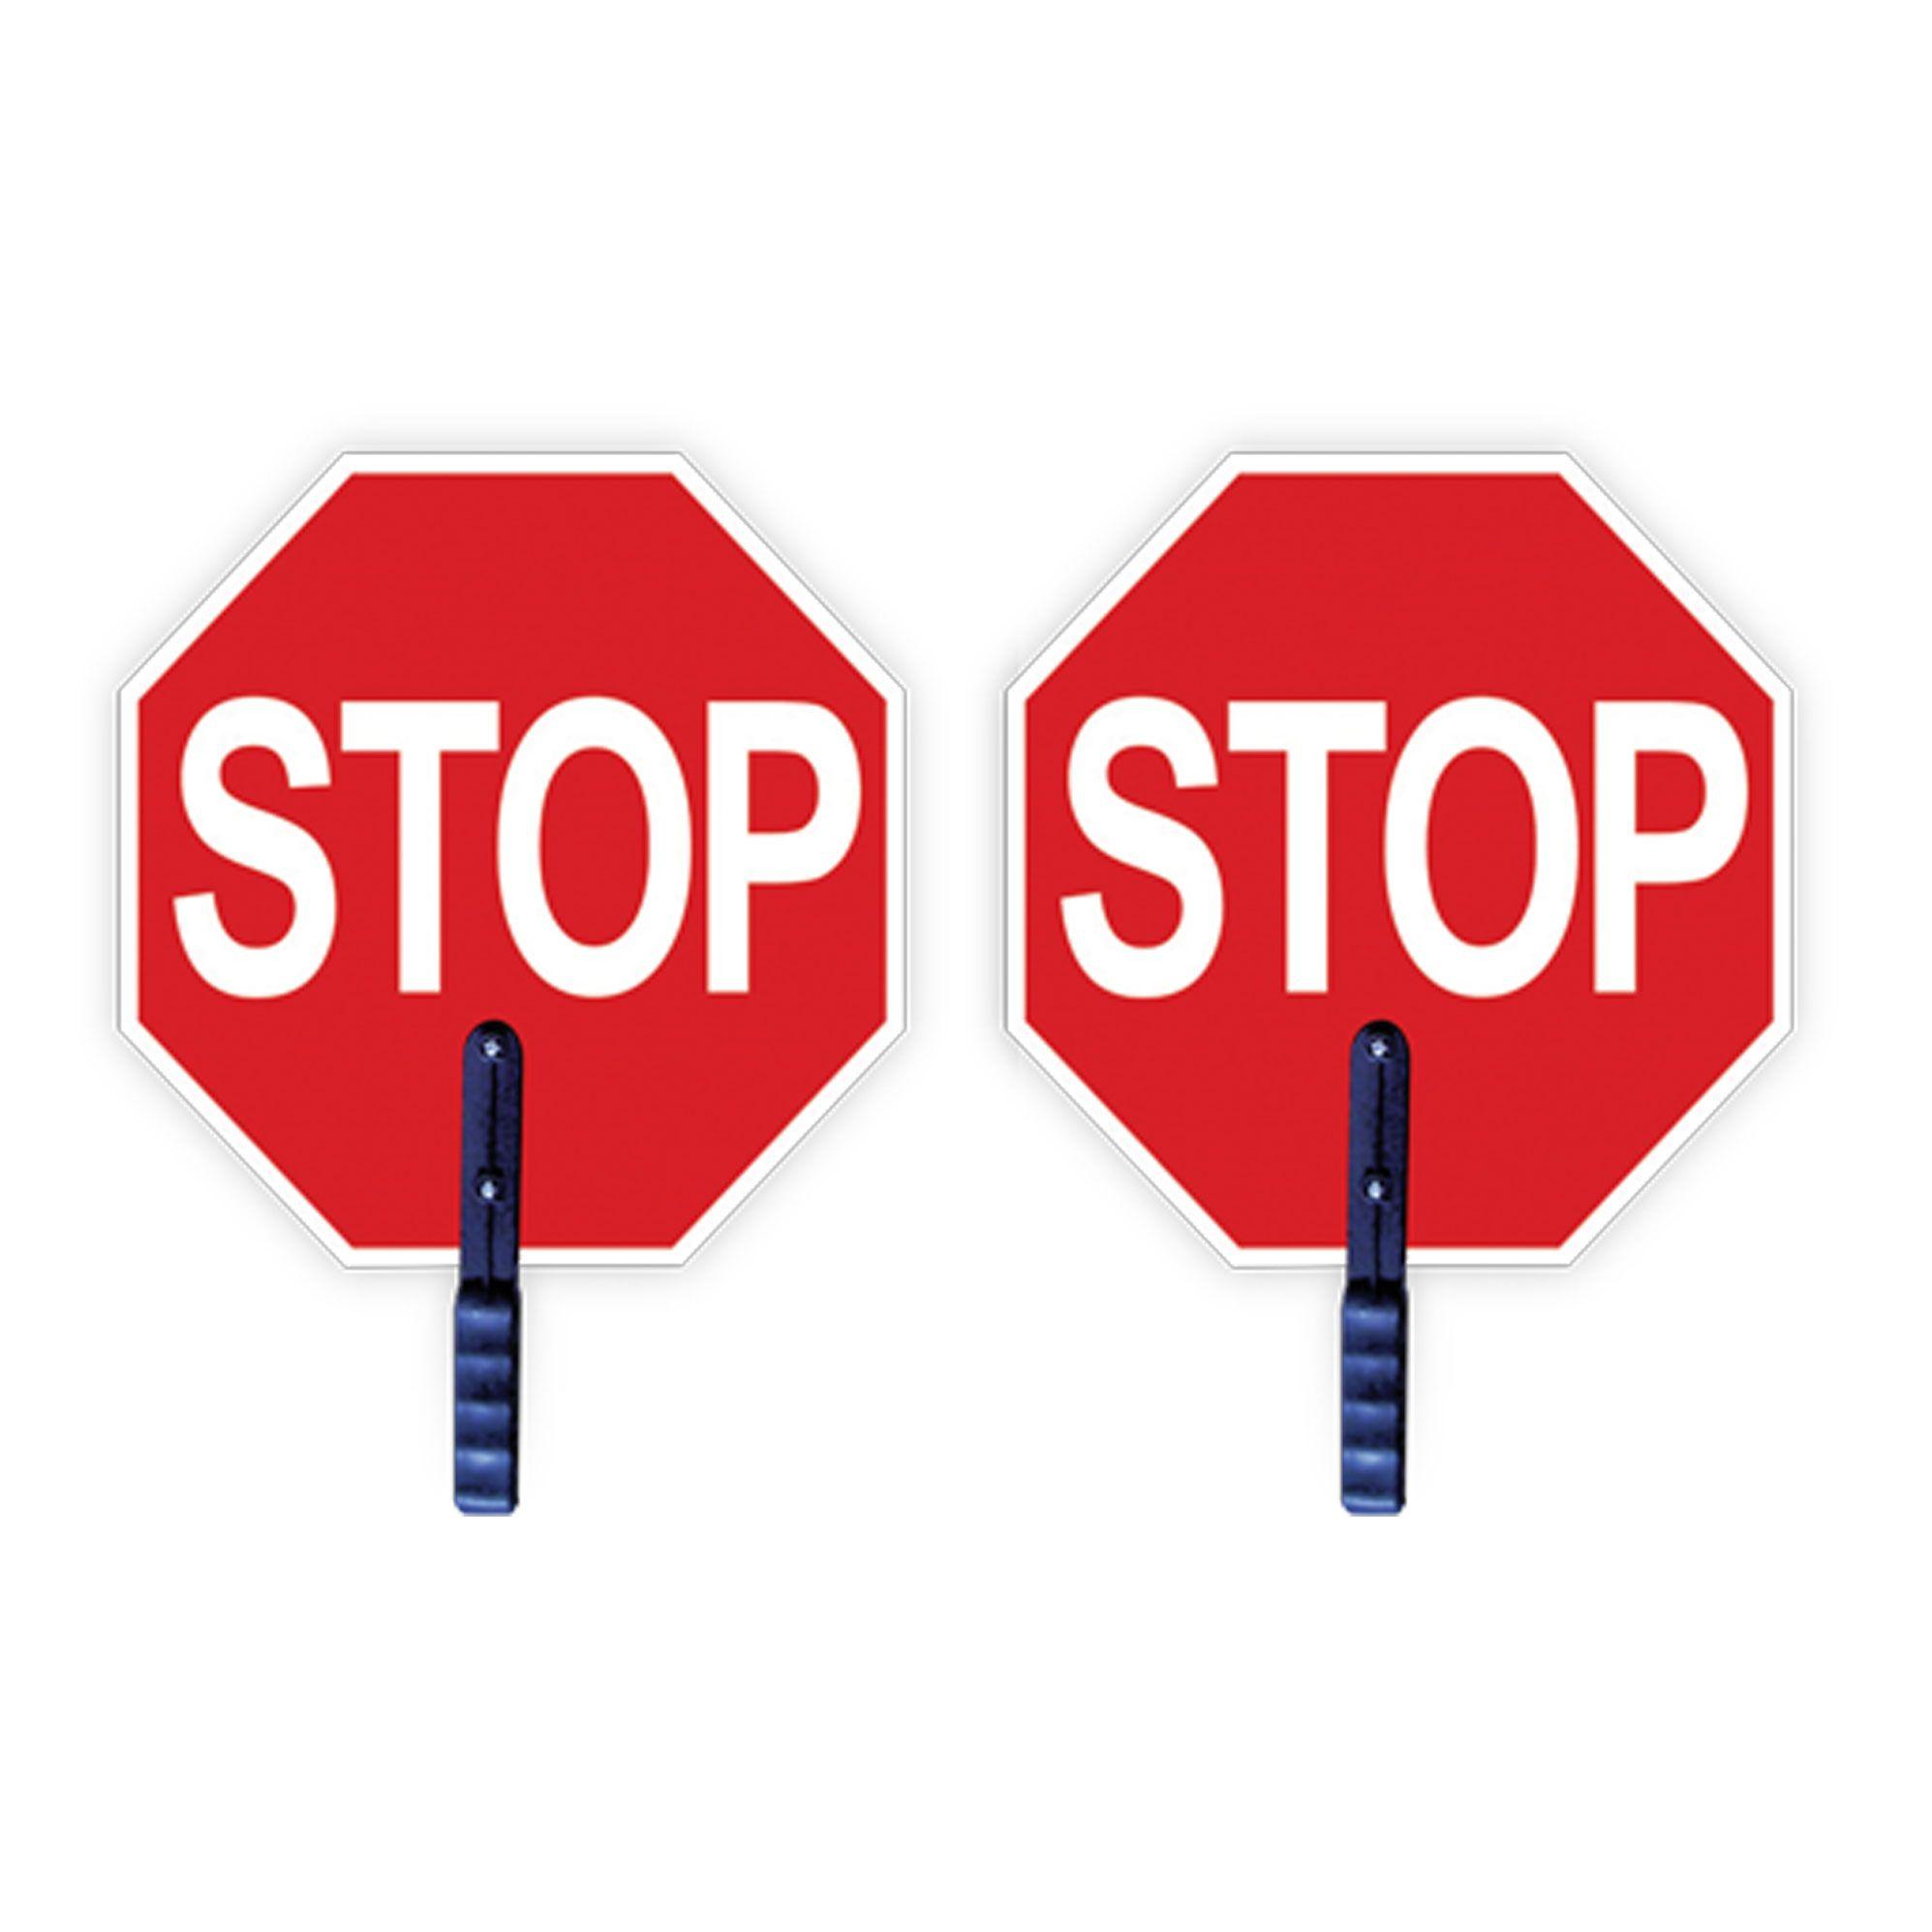 Engineering Grade Traffic Safety Paddle - Stop/Stop-2W International